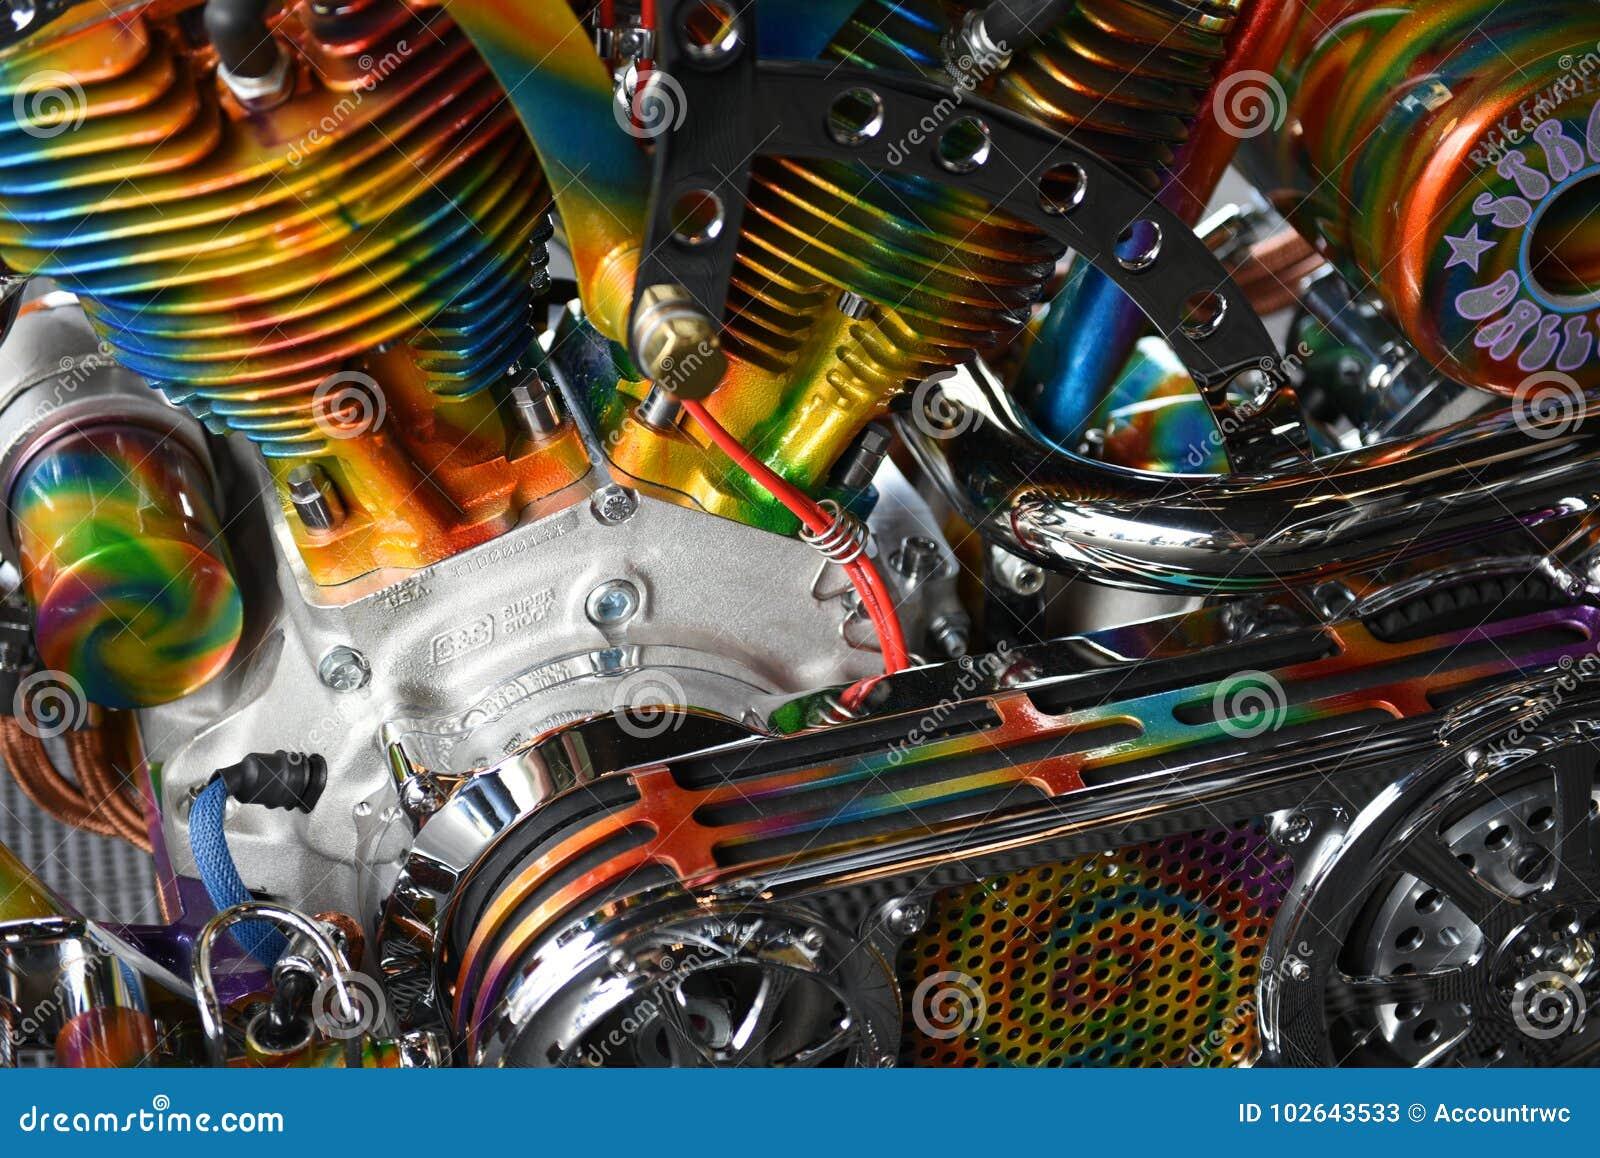 Colorful motorcycle engine, Sturgis, South Dakota, August 2017